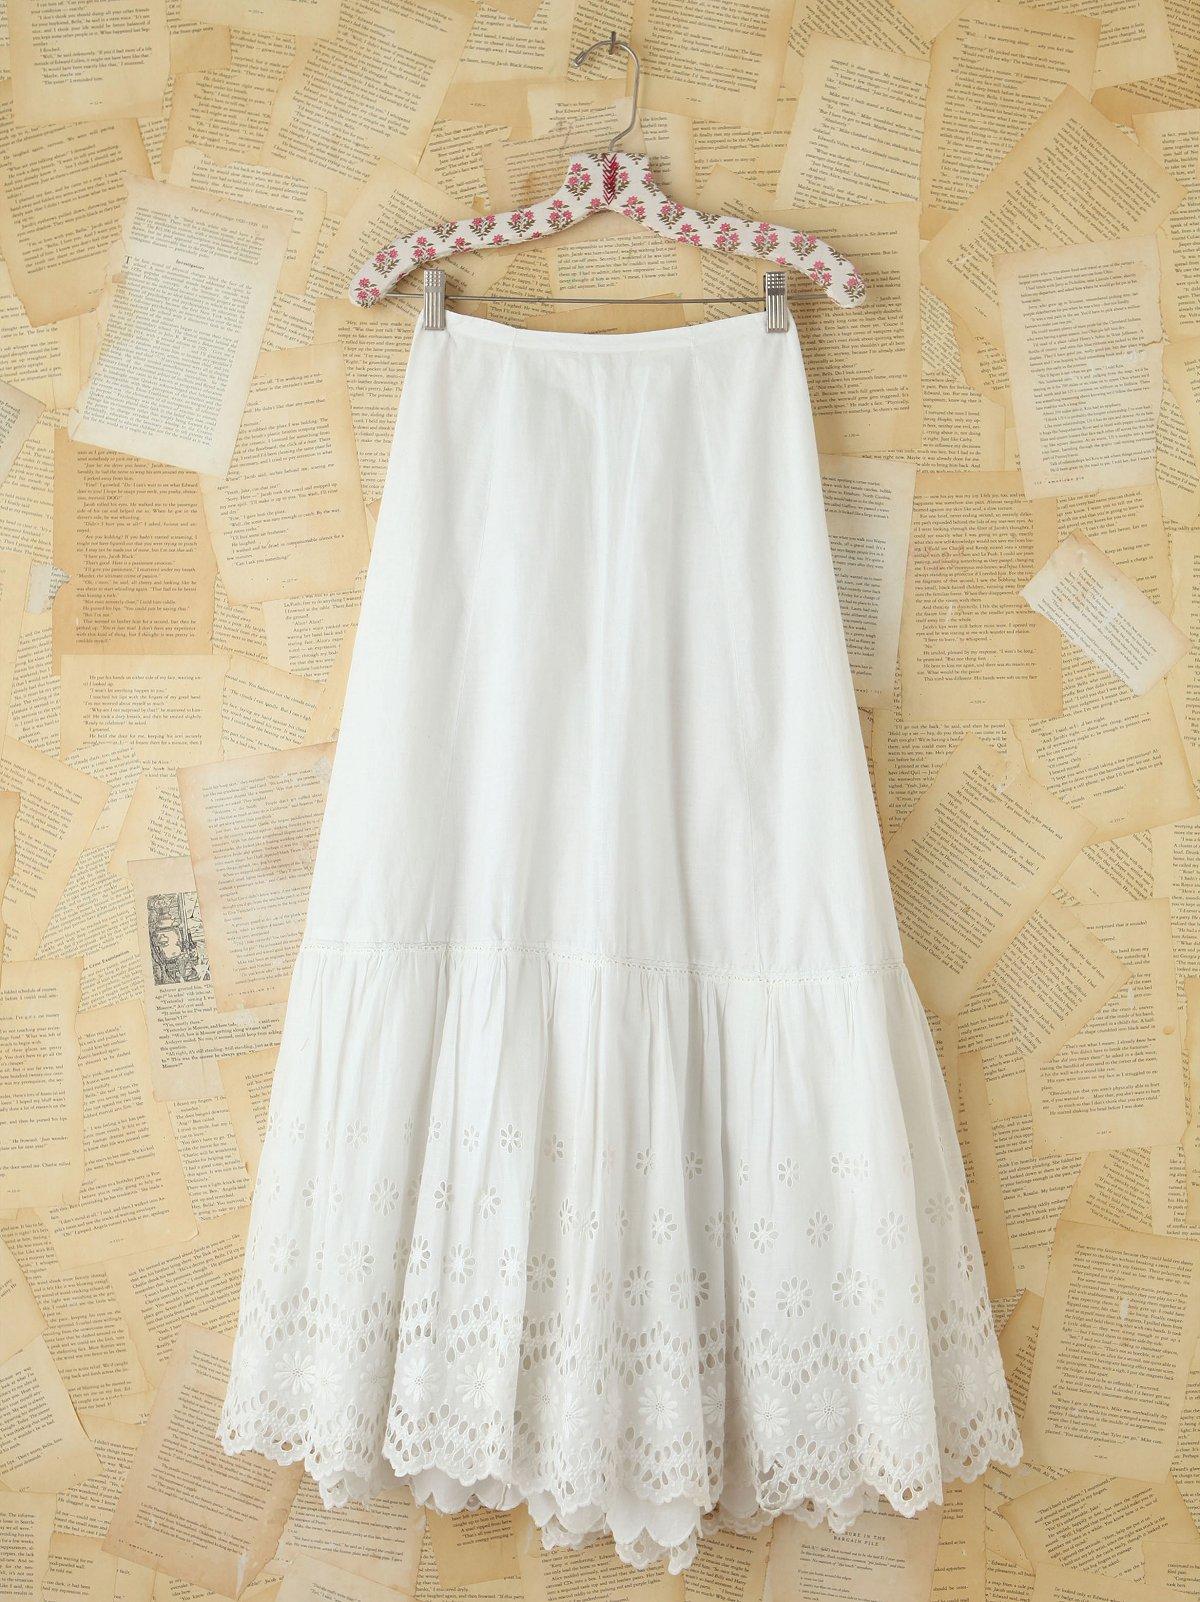 Vintage Cotton Eyelet Skirt